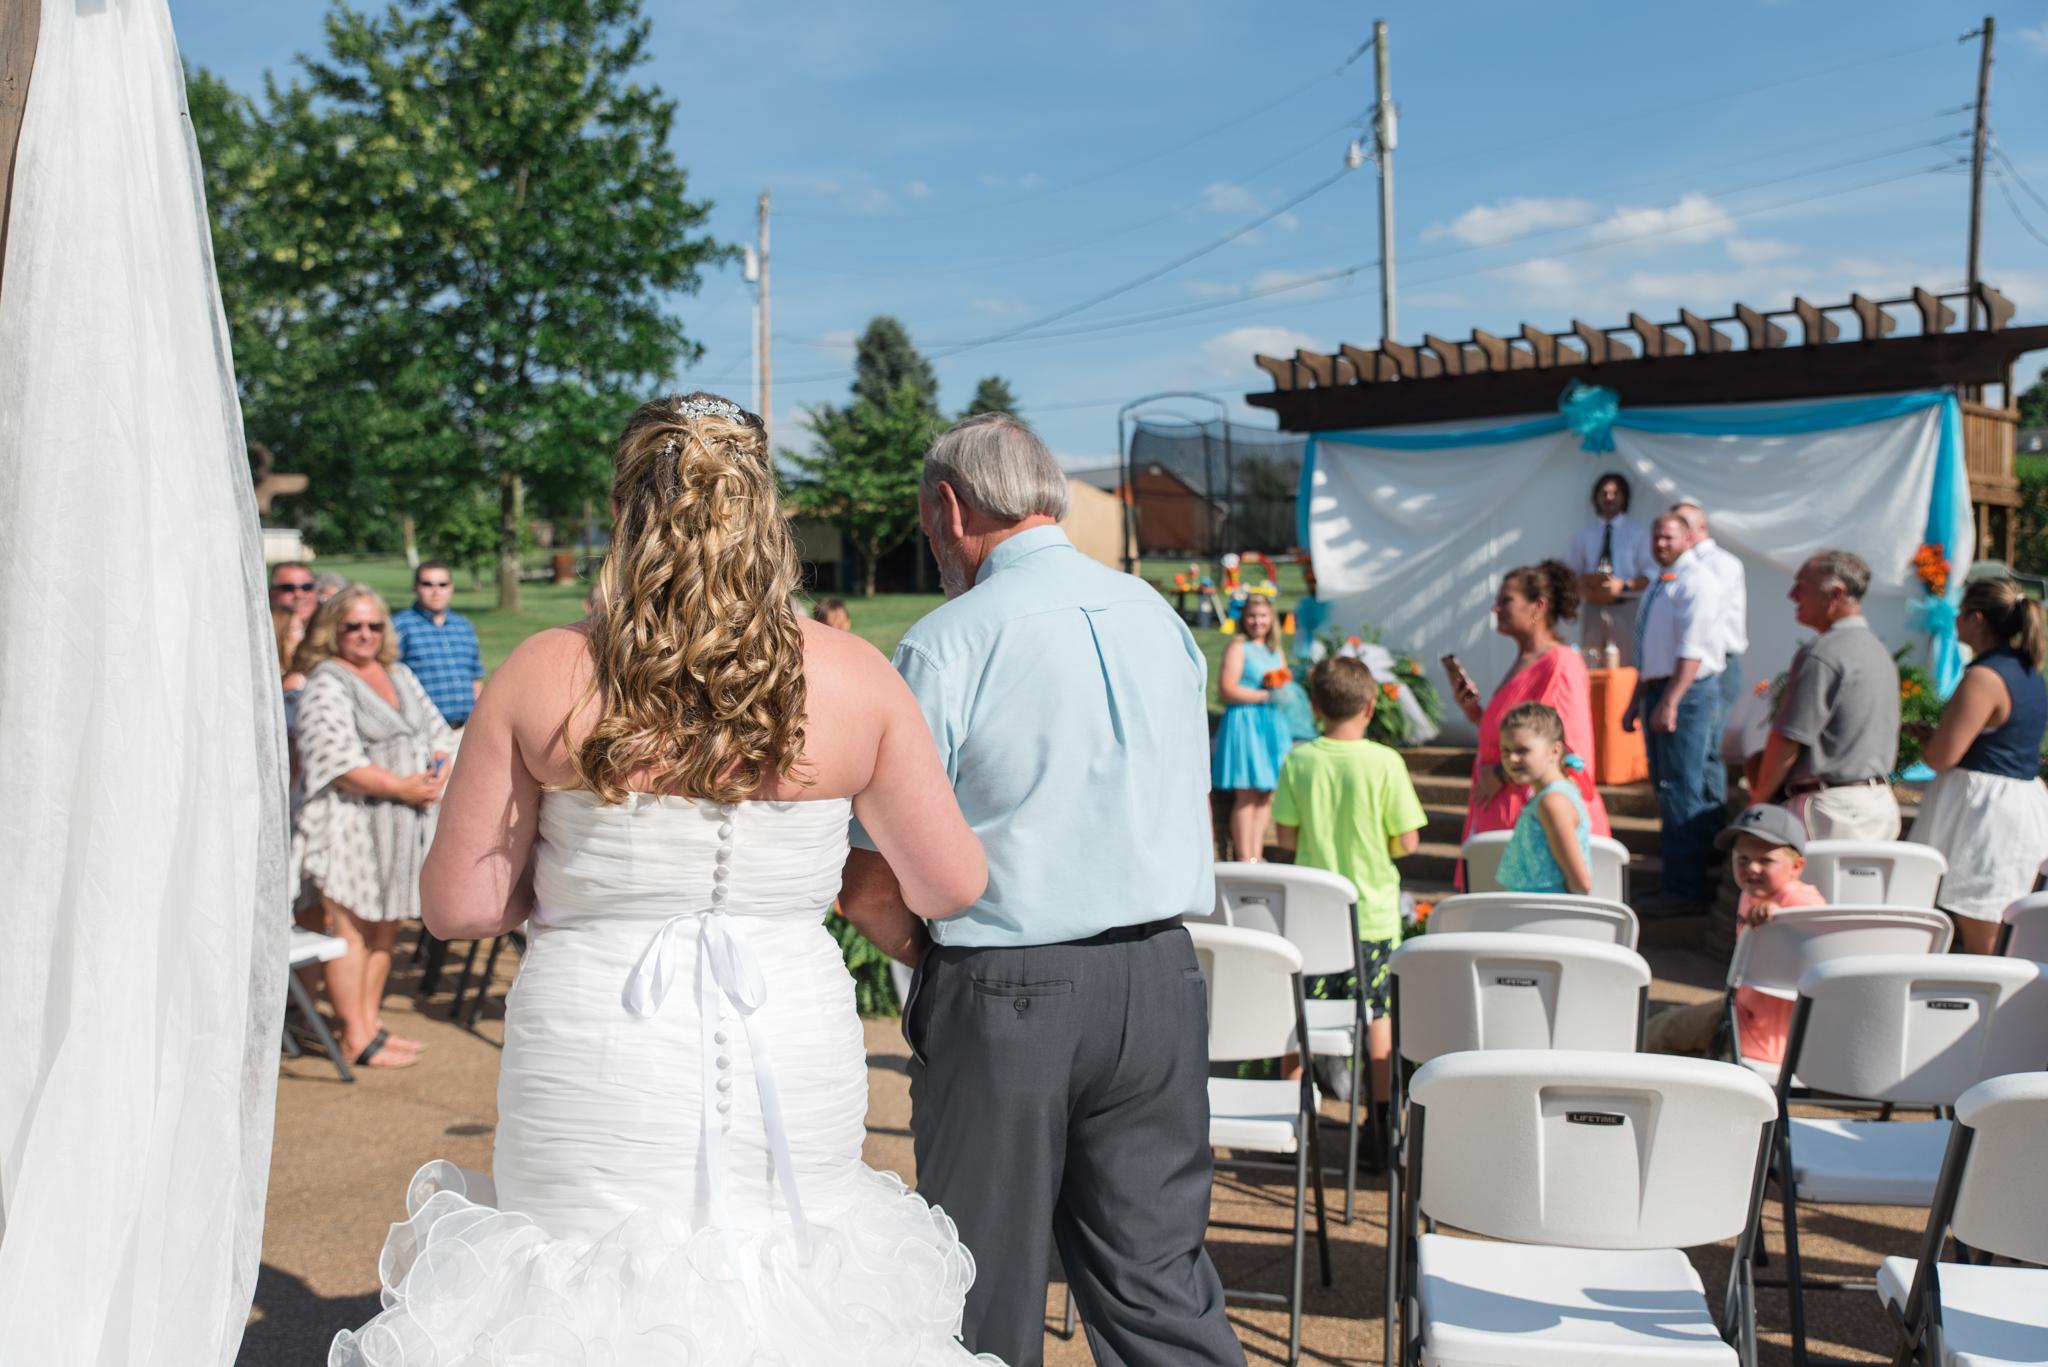 Winchester KY, Kentucky bride, Kentucky wedding, ky wedding photographer, wedding photos, central ky wedding